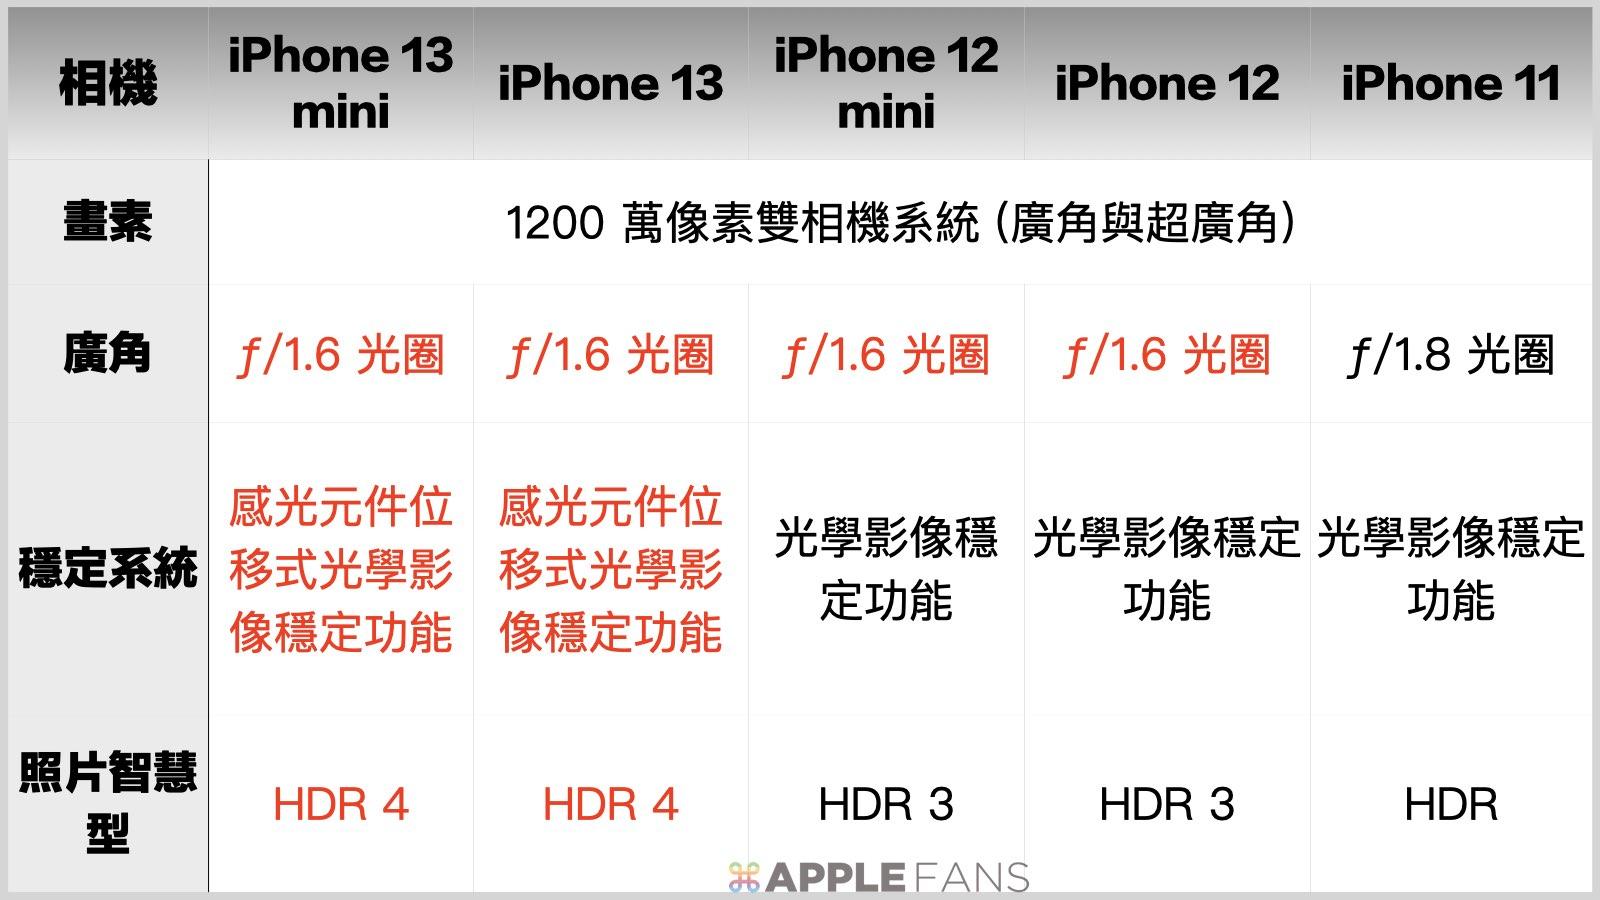 鏡頭比一比 - iPhone 13 mini / iPhone 13 / iPhone 12 mimi / iPhone 12 / iPhone 11